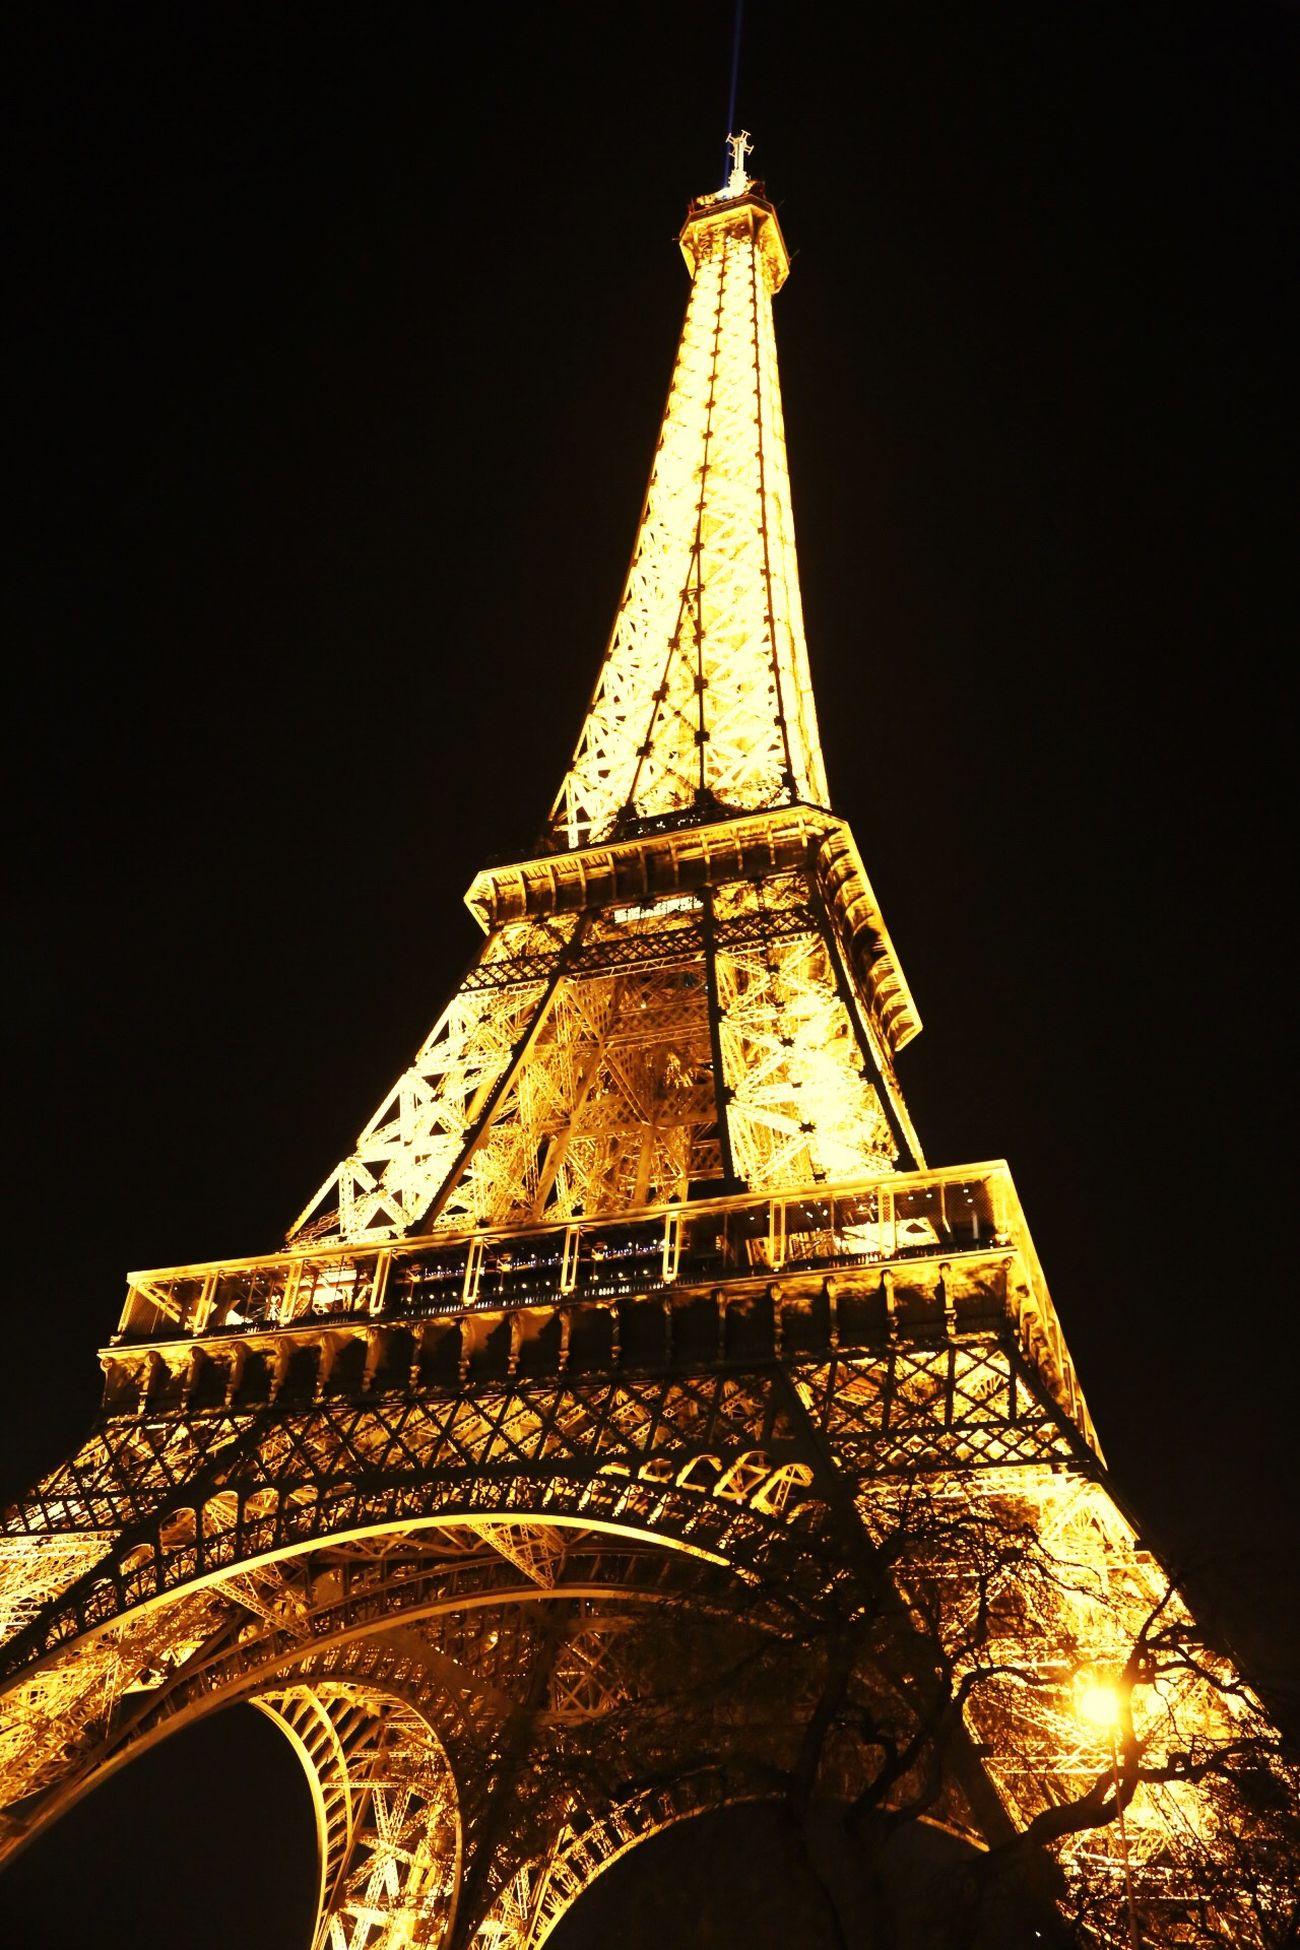 Pariseyfeltower Love Photographer @banubakacak Photo Happynewyear 2015  Paris